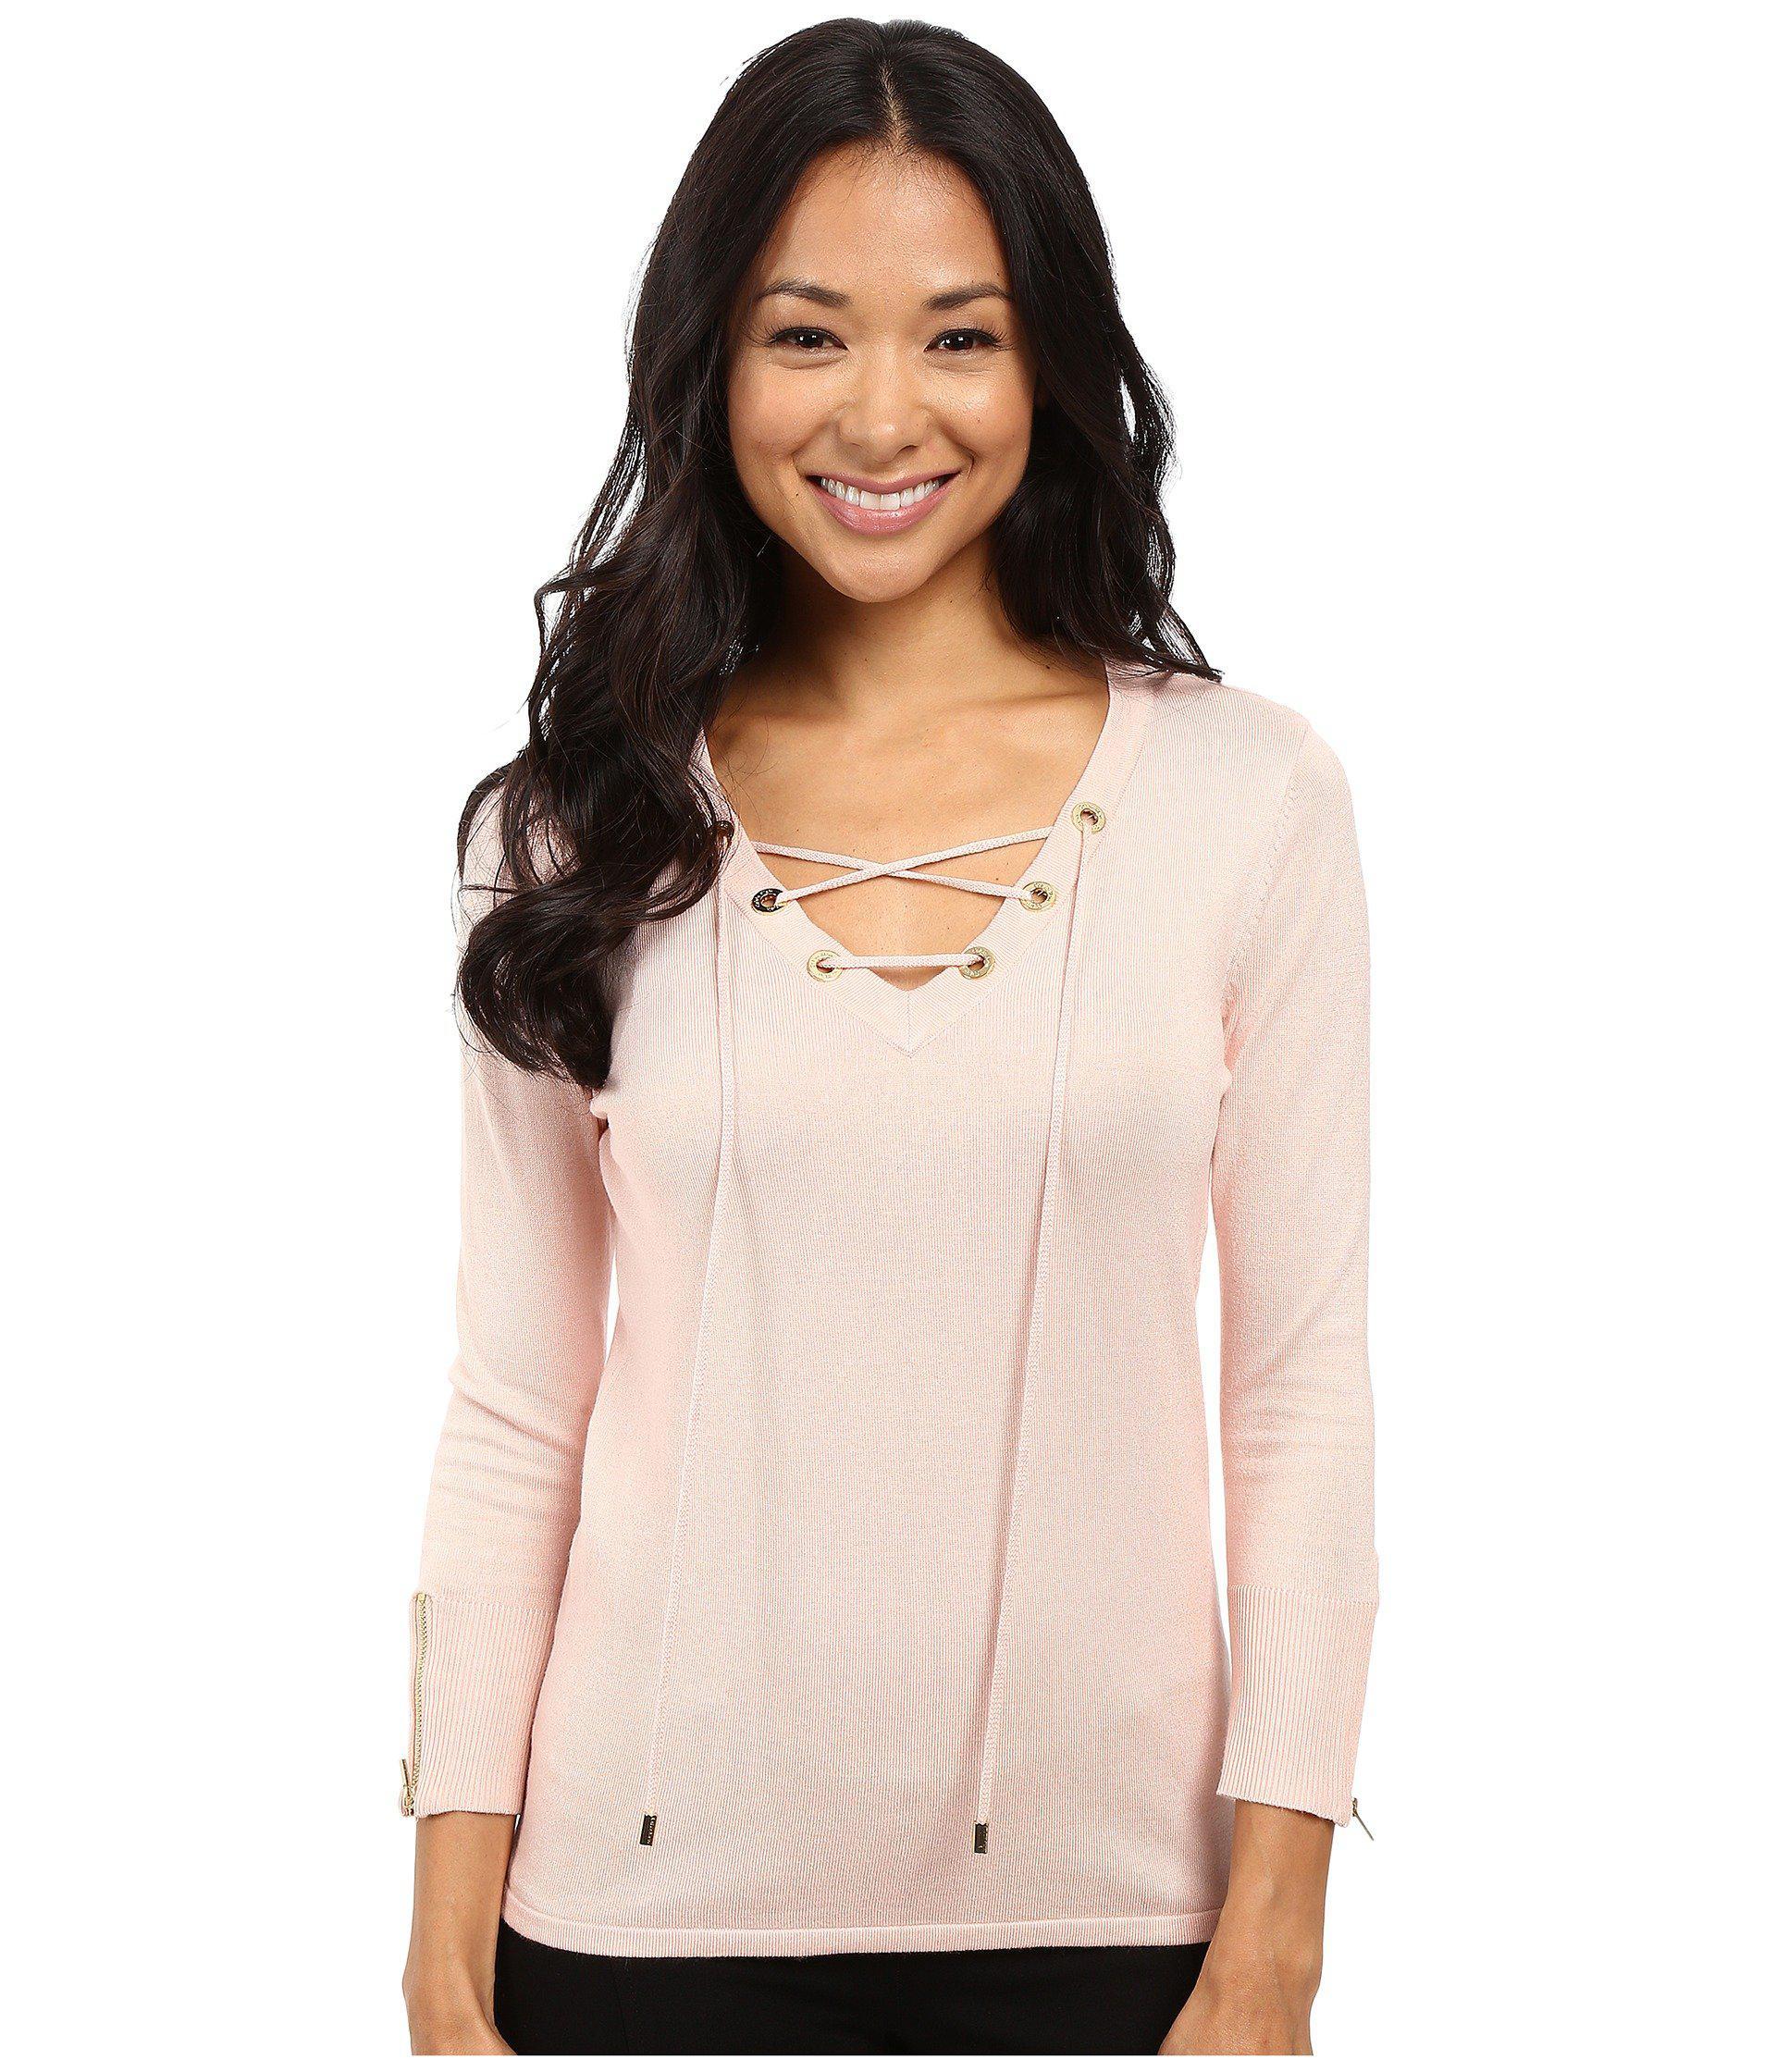 Lyst - Calvin Klein Fine Gauge Lace-up Sweater in Pink 59f4ea9c9